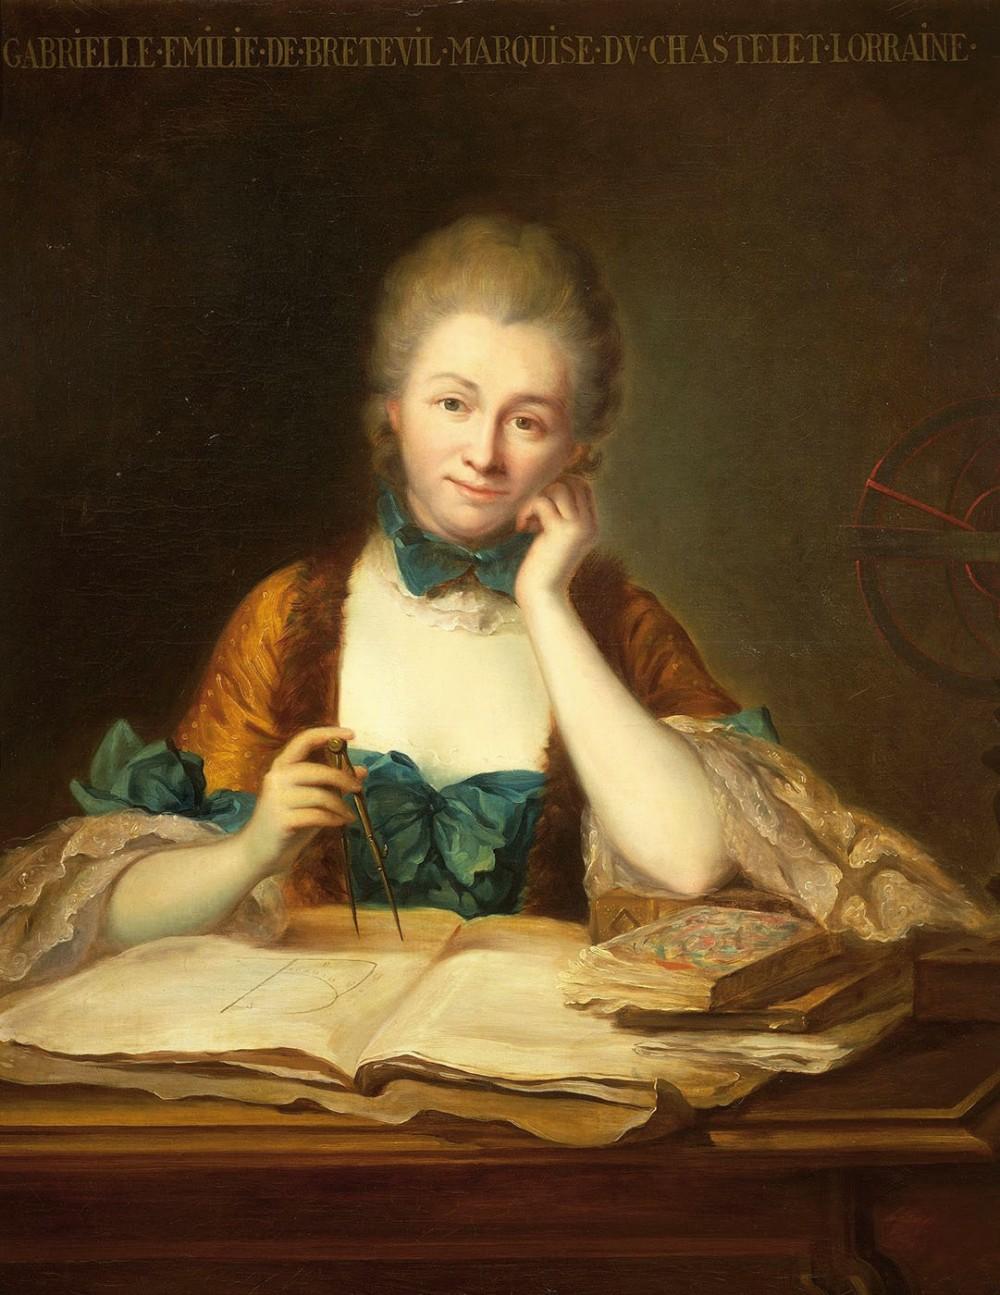 Anónimo.Gabrielle Emilie de Breteuil.Marquesa de Chatelet. Siglo XVIII Colección particular.